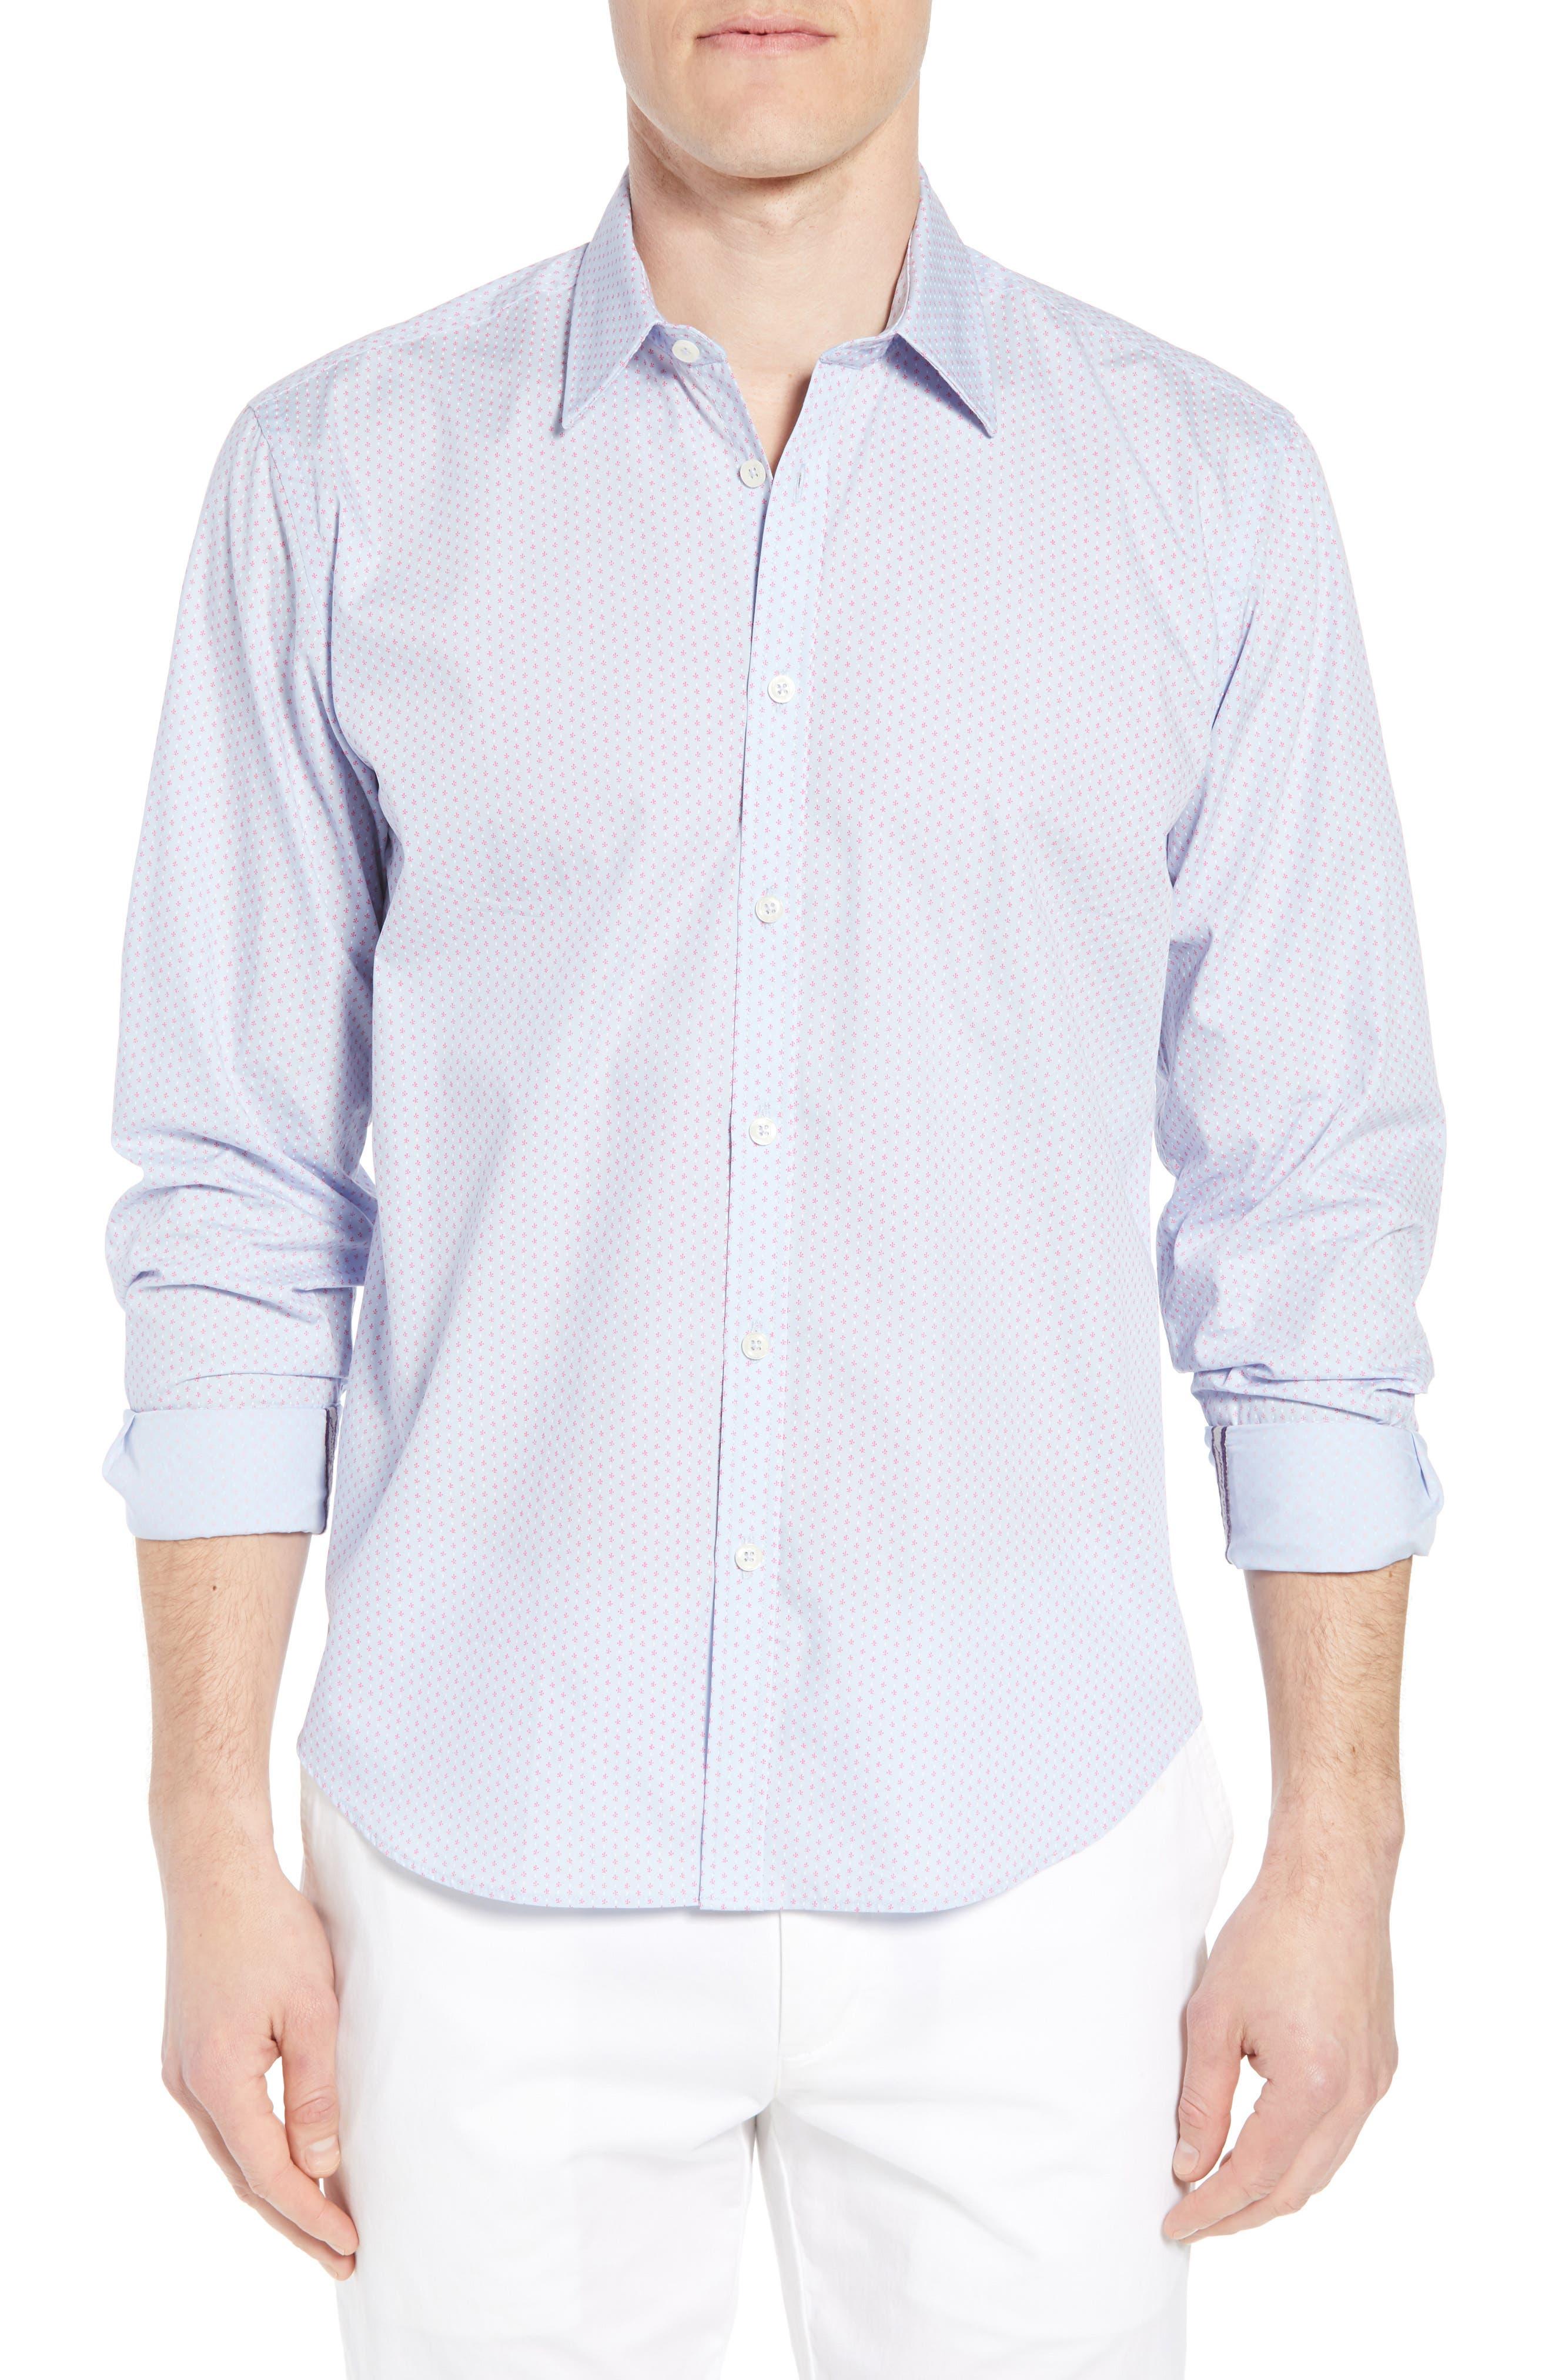 Jeremy Argyle Comfort Fit Print Sport Shirt